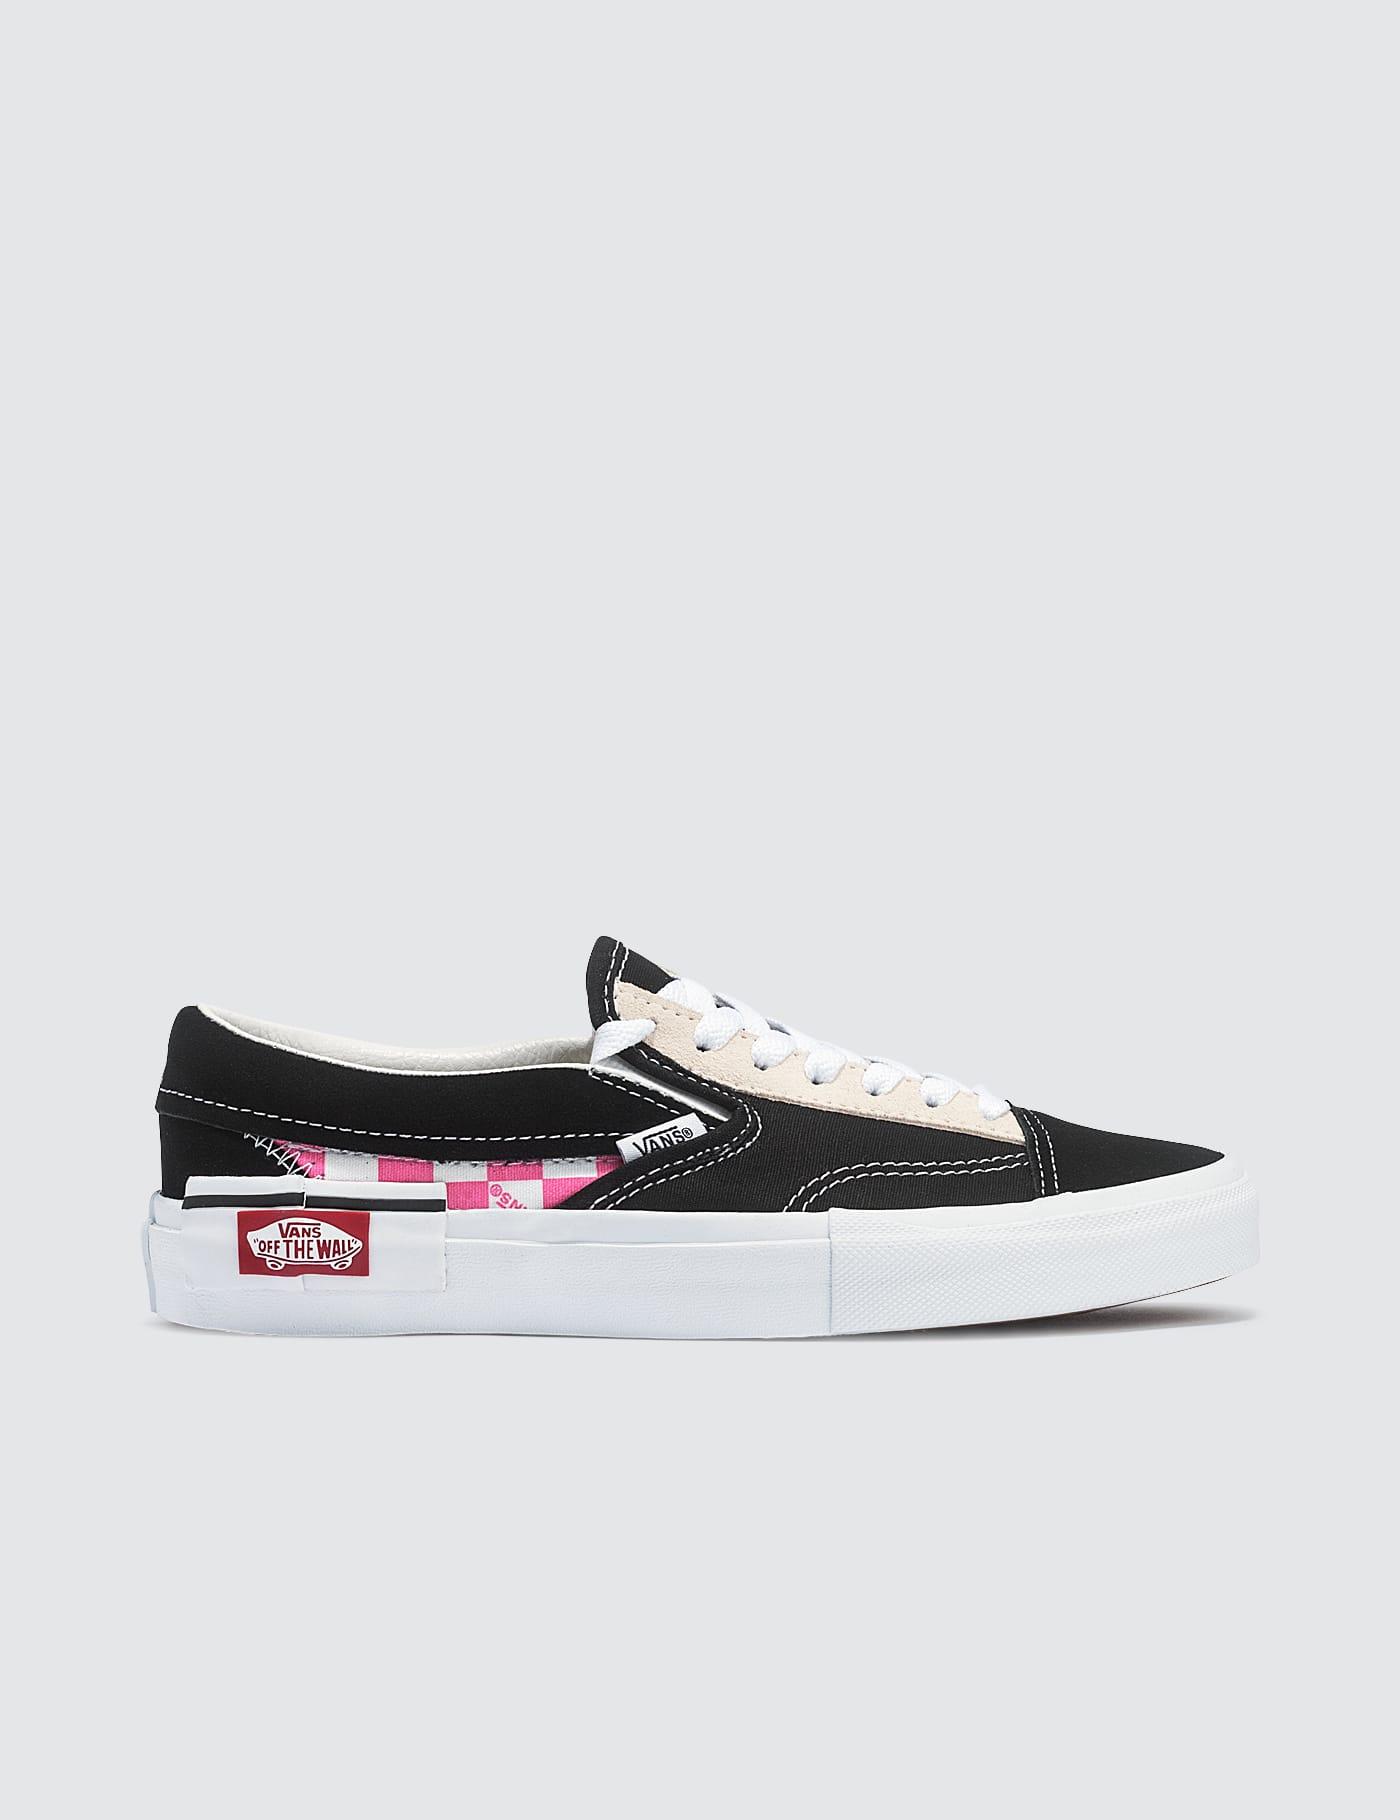 Vans - Slip-on Cap   HBX